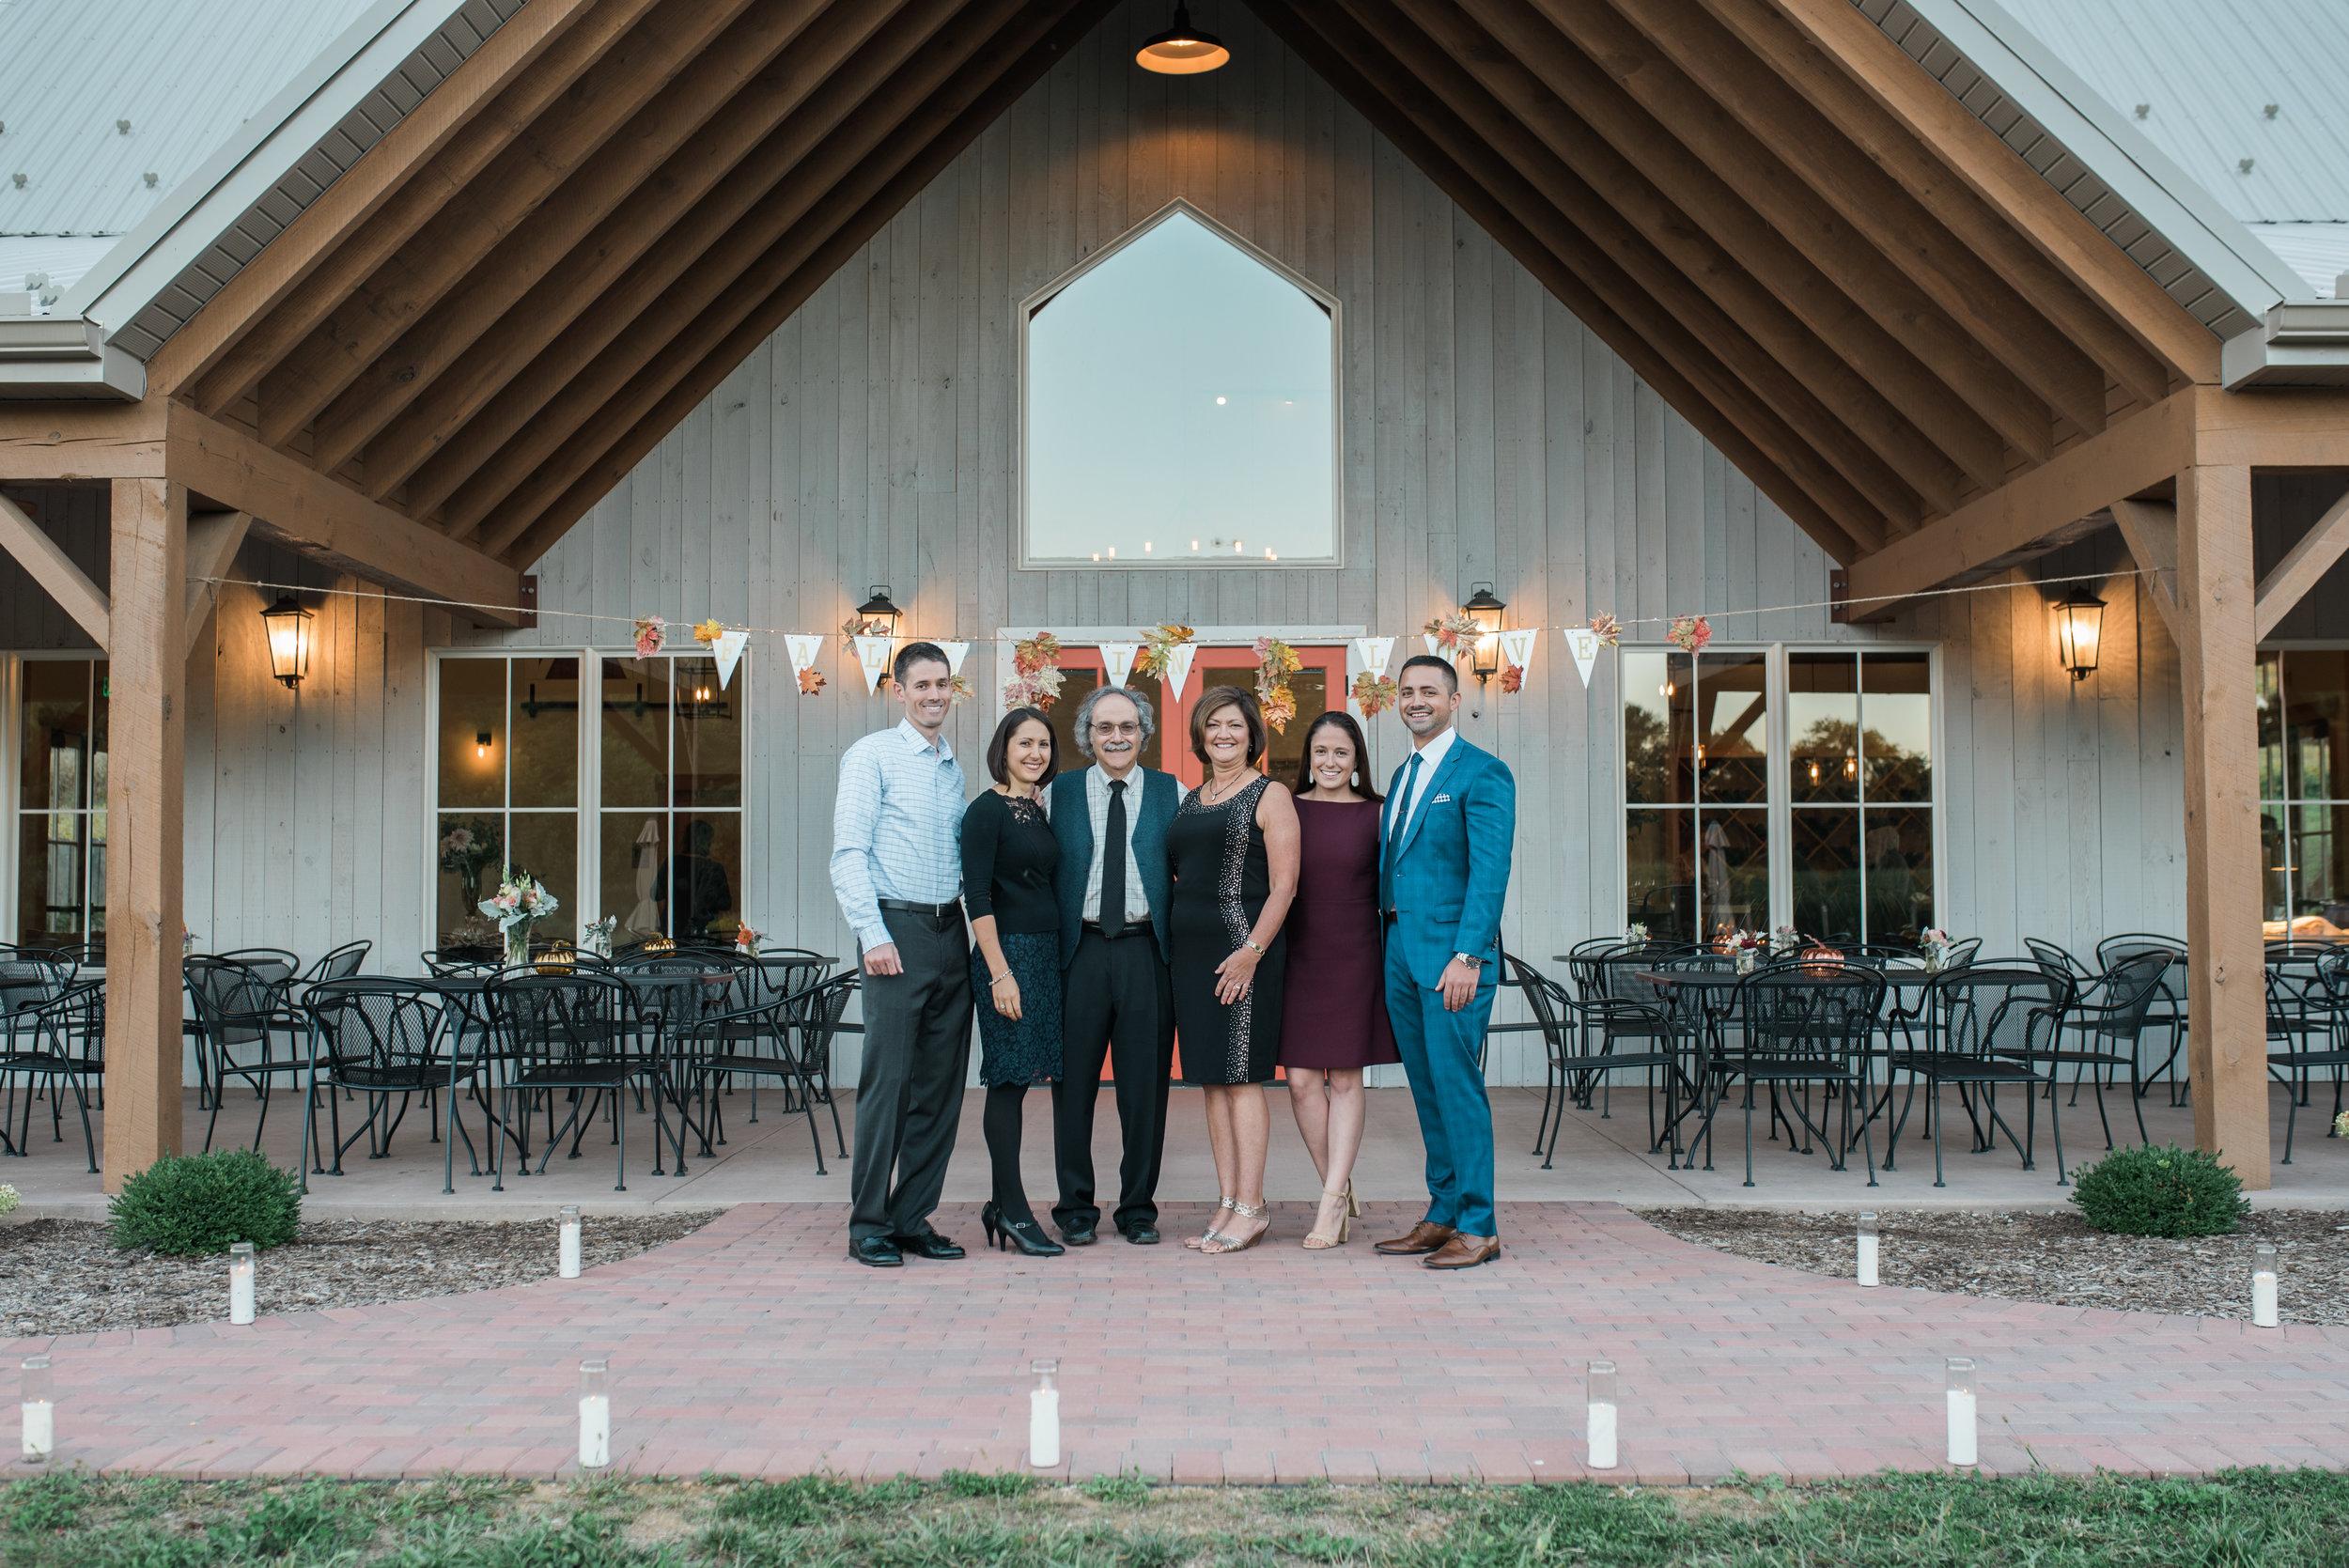 Engagement-Maryland-Winery-photos-by-BKLP-Breanna-Kuhlmann-11.jpg